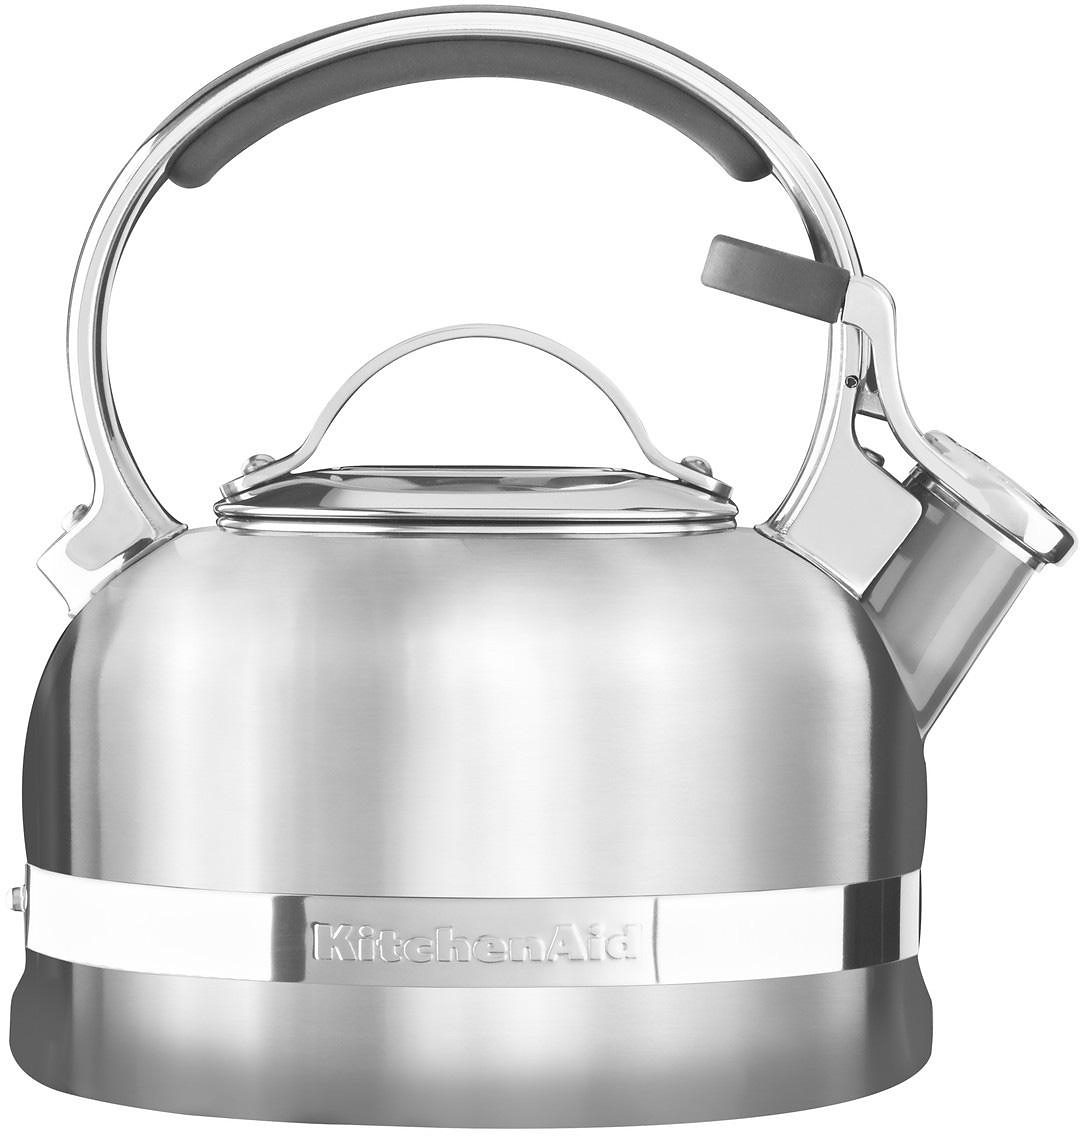 KitchenAid Wasserkessel KTEN20SBST, 1,9 Liter